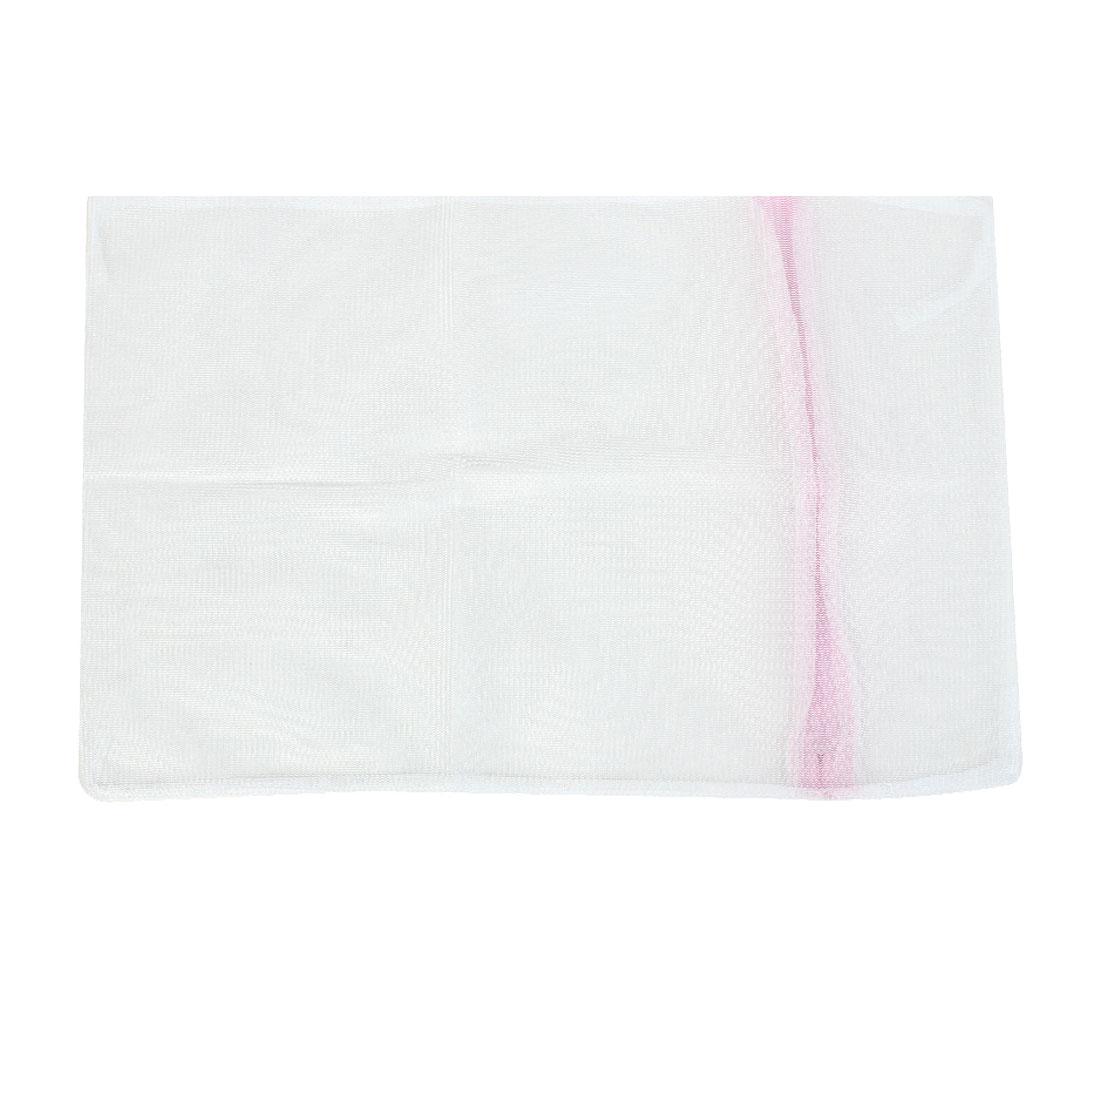 Zipped White Nylon Mesh Wash Medium Socks Cloths Underwear Laundry Net Washing Bag 30 x 40cm